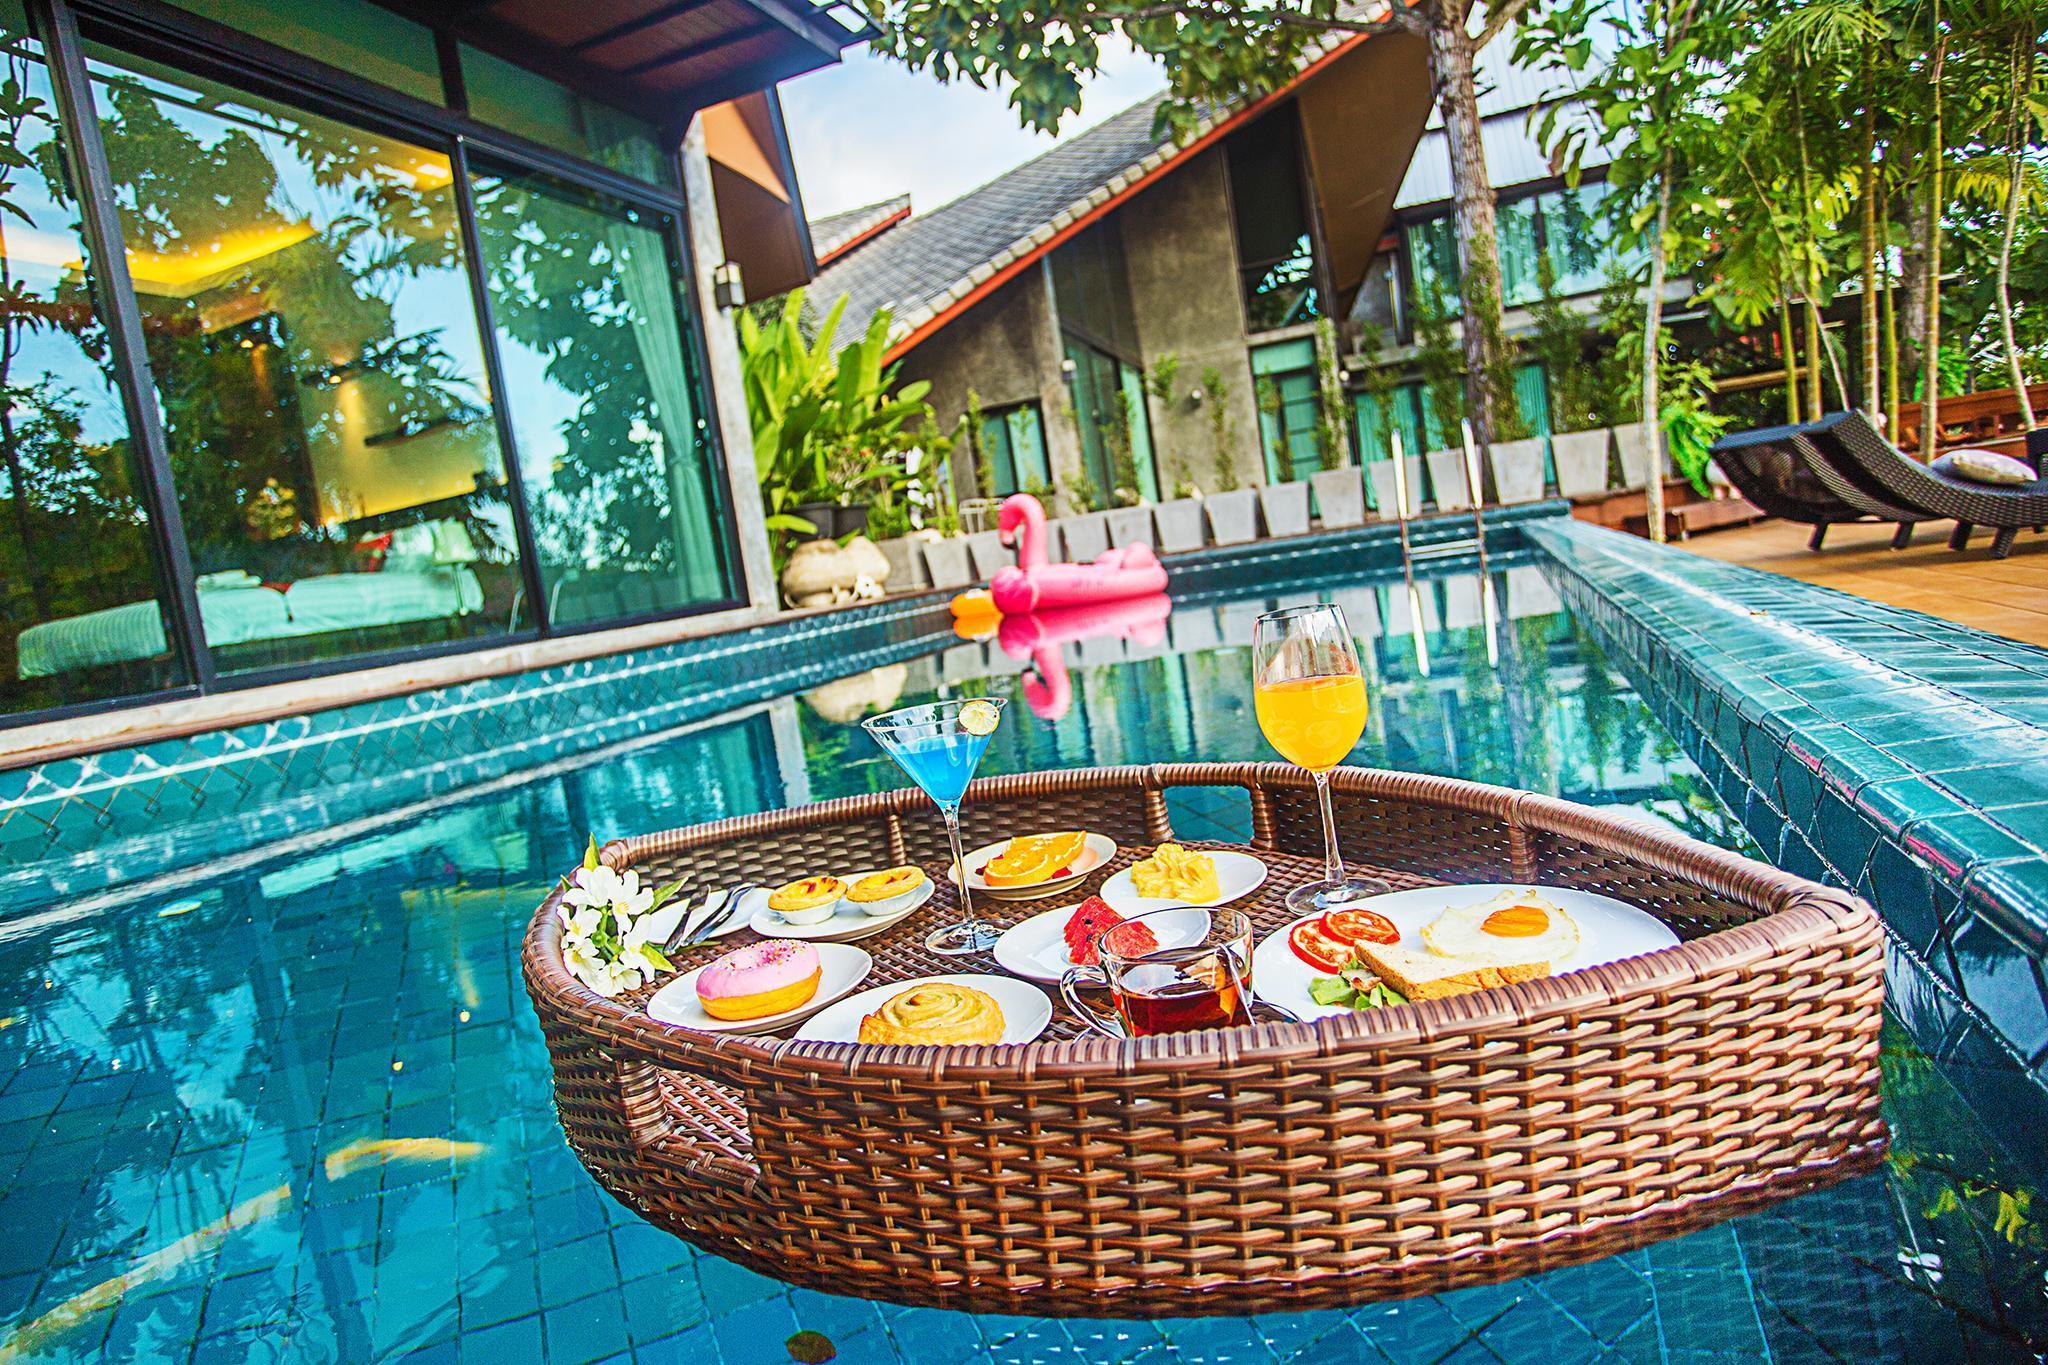 Luxury pool  villa with doi suthep super view 5BR วิลลา 5 ห้องนอน 5 ห้องน้ำส่วนตัว ขนาด 550 ตร.ม. – ห้วยแก้ว